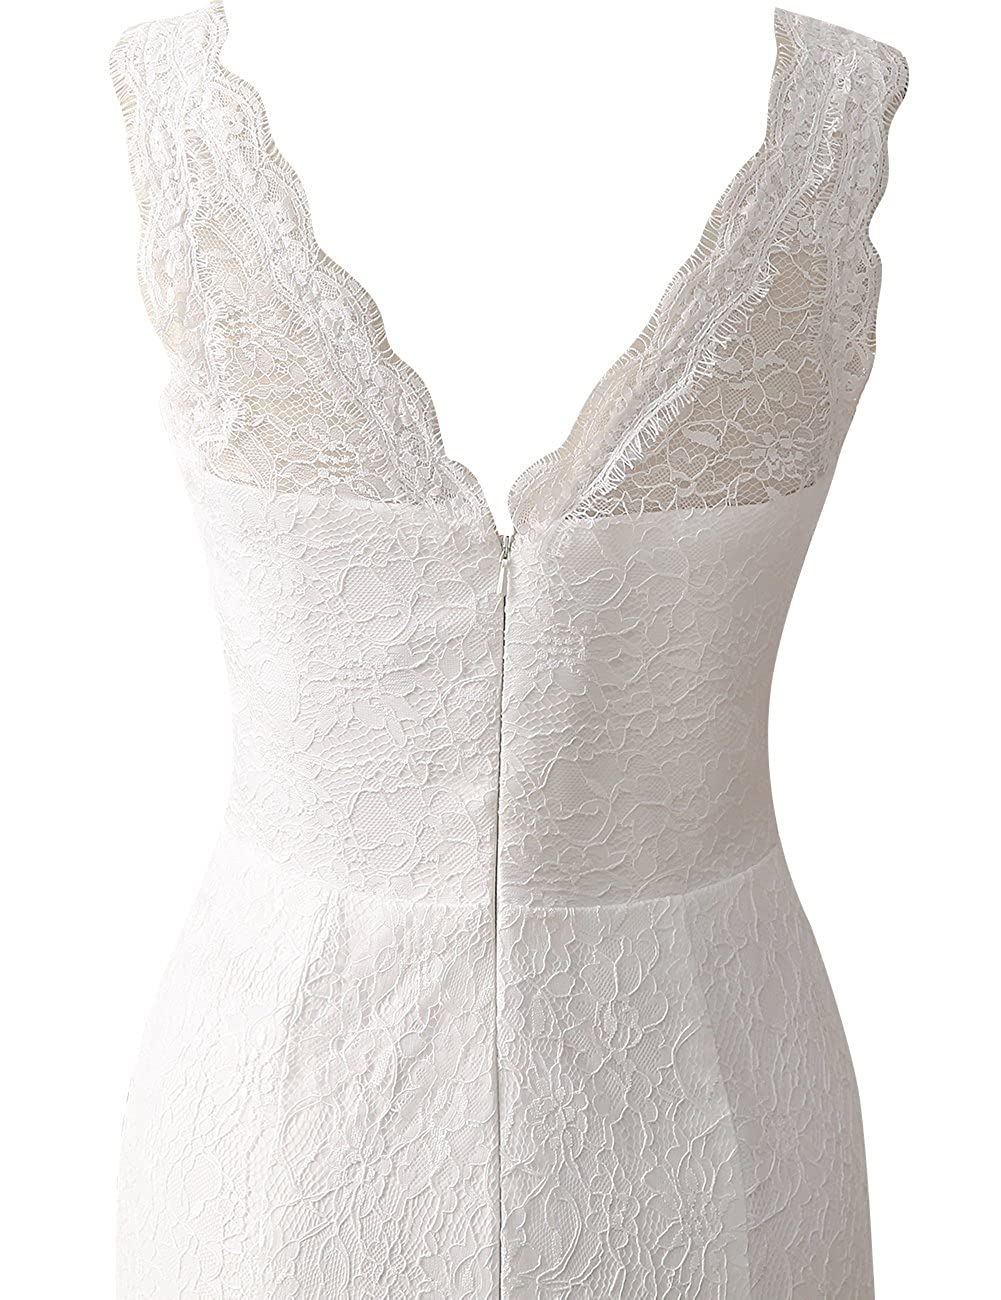 JAEDEN Lace Wedding Dress Mermaid Bridal Gown V Neck